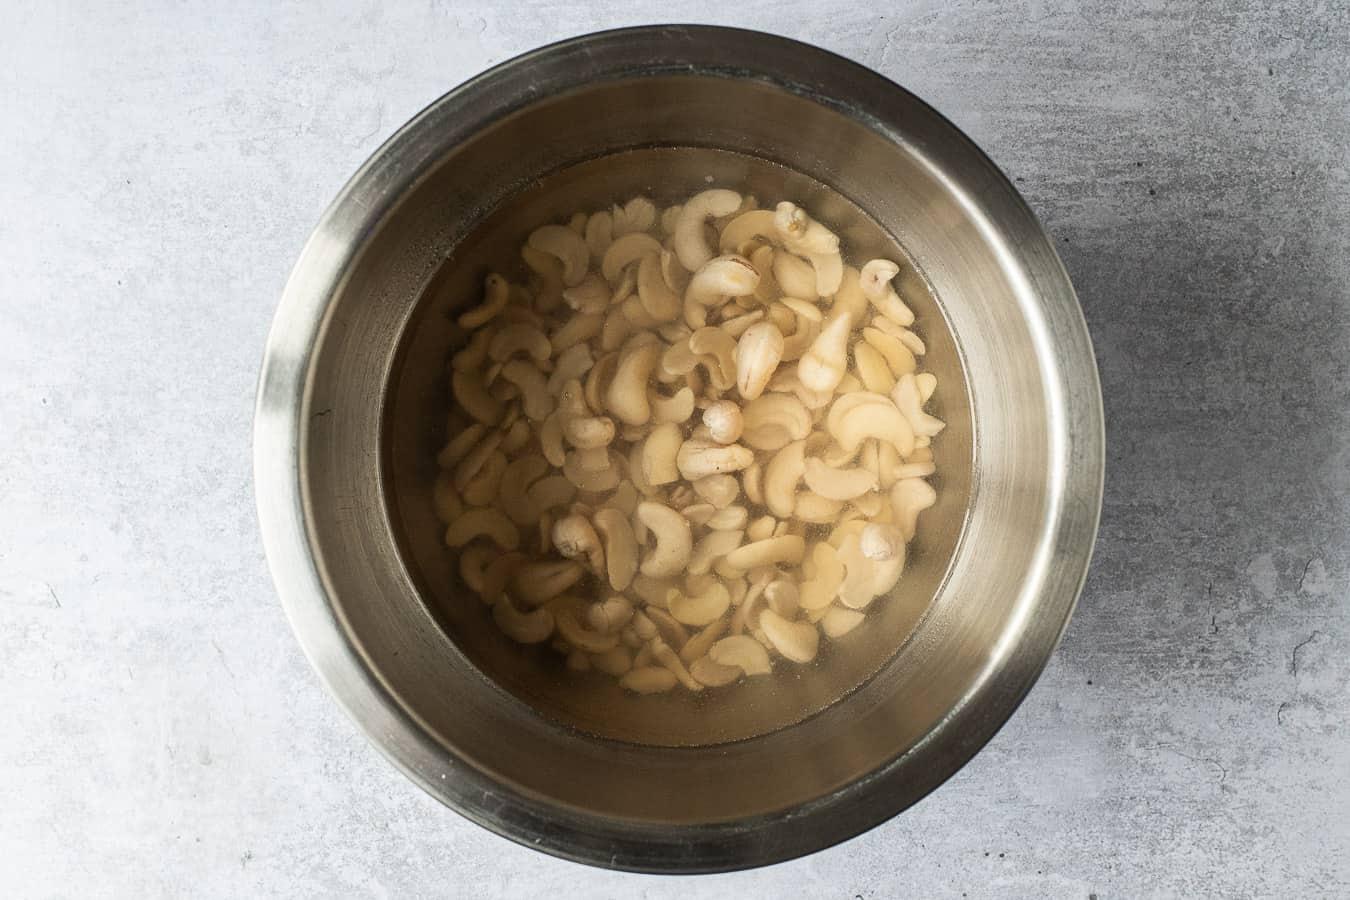 step 1 - soaking the cashews